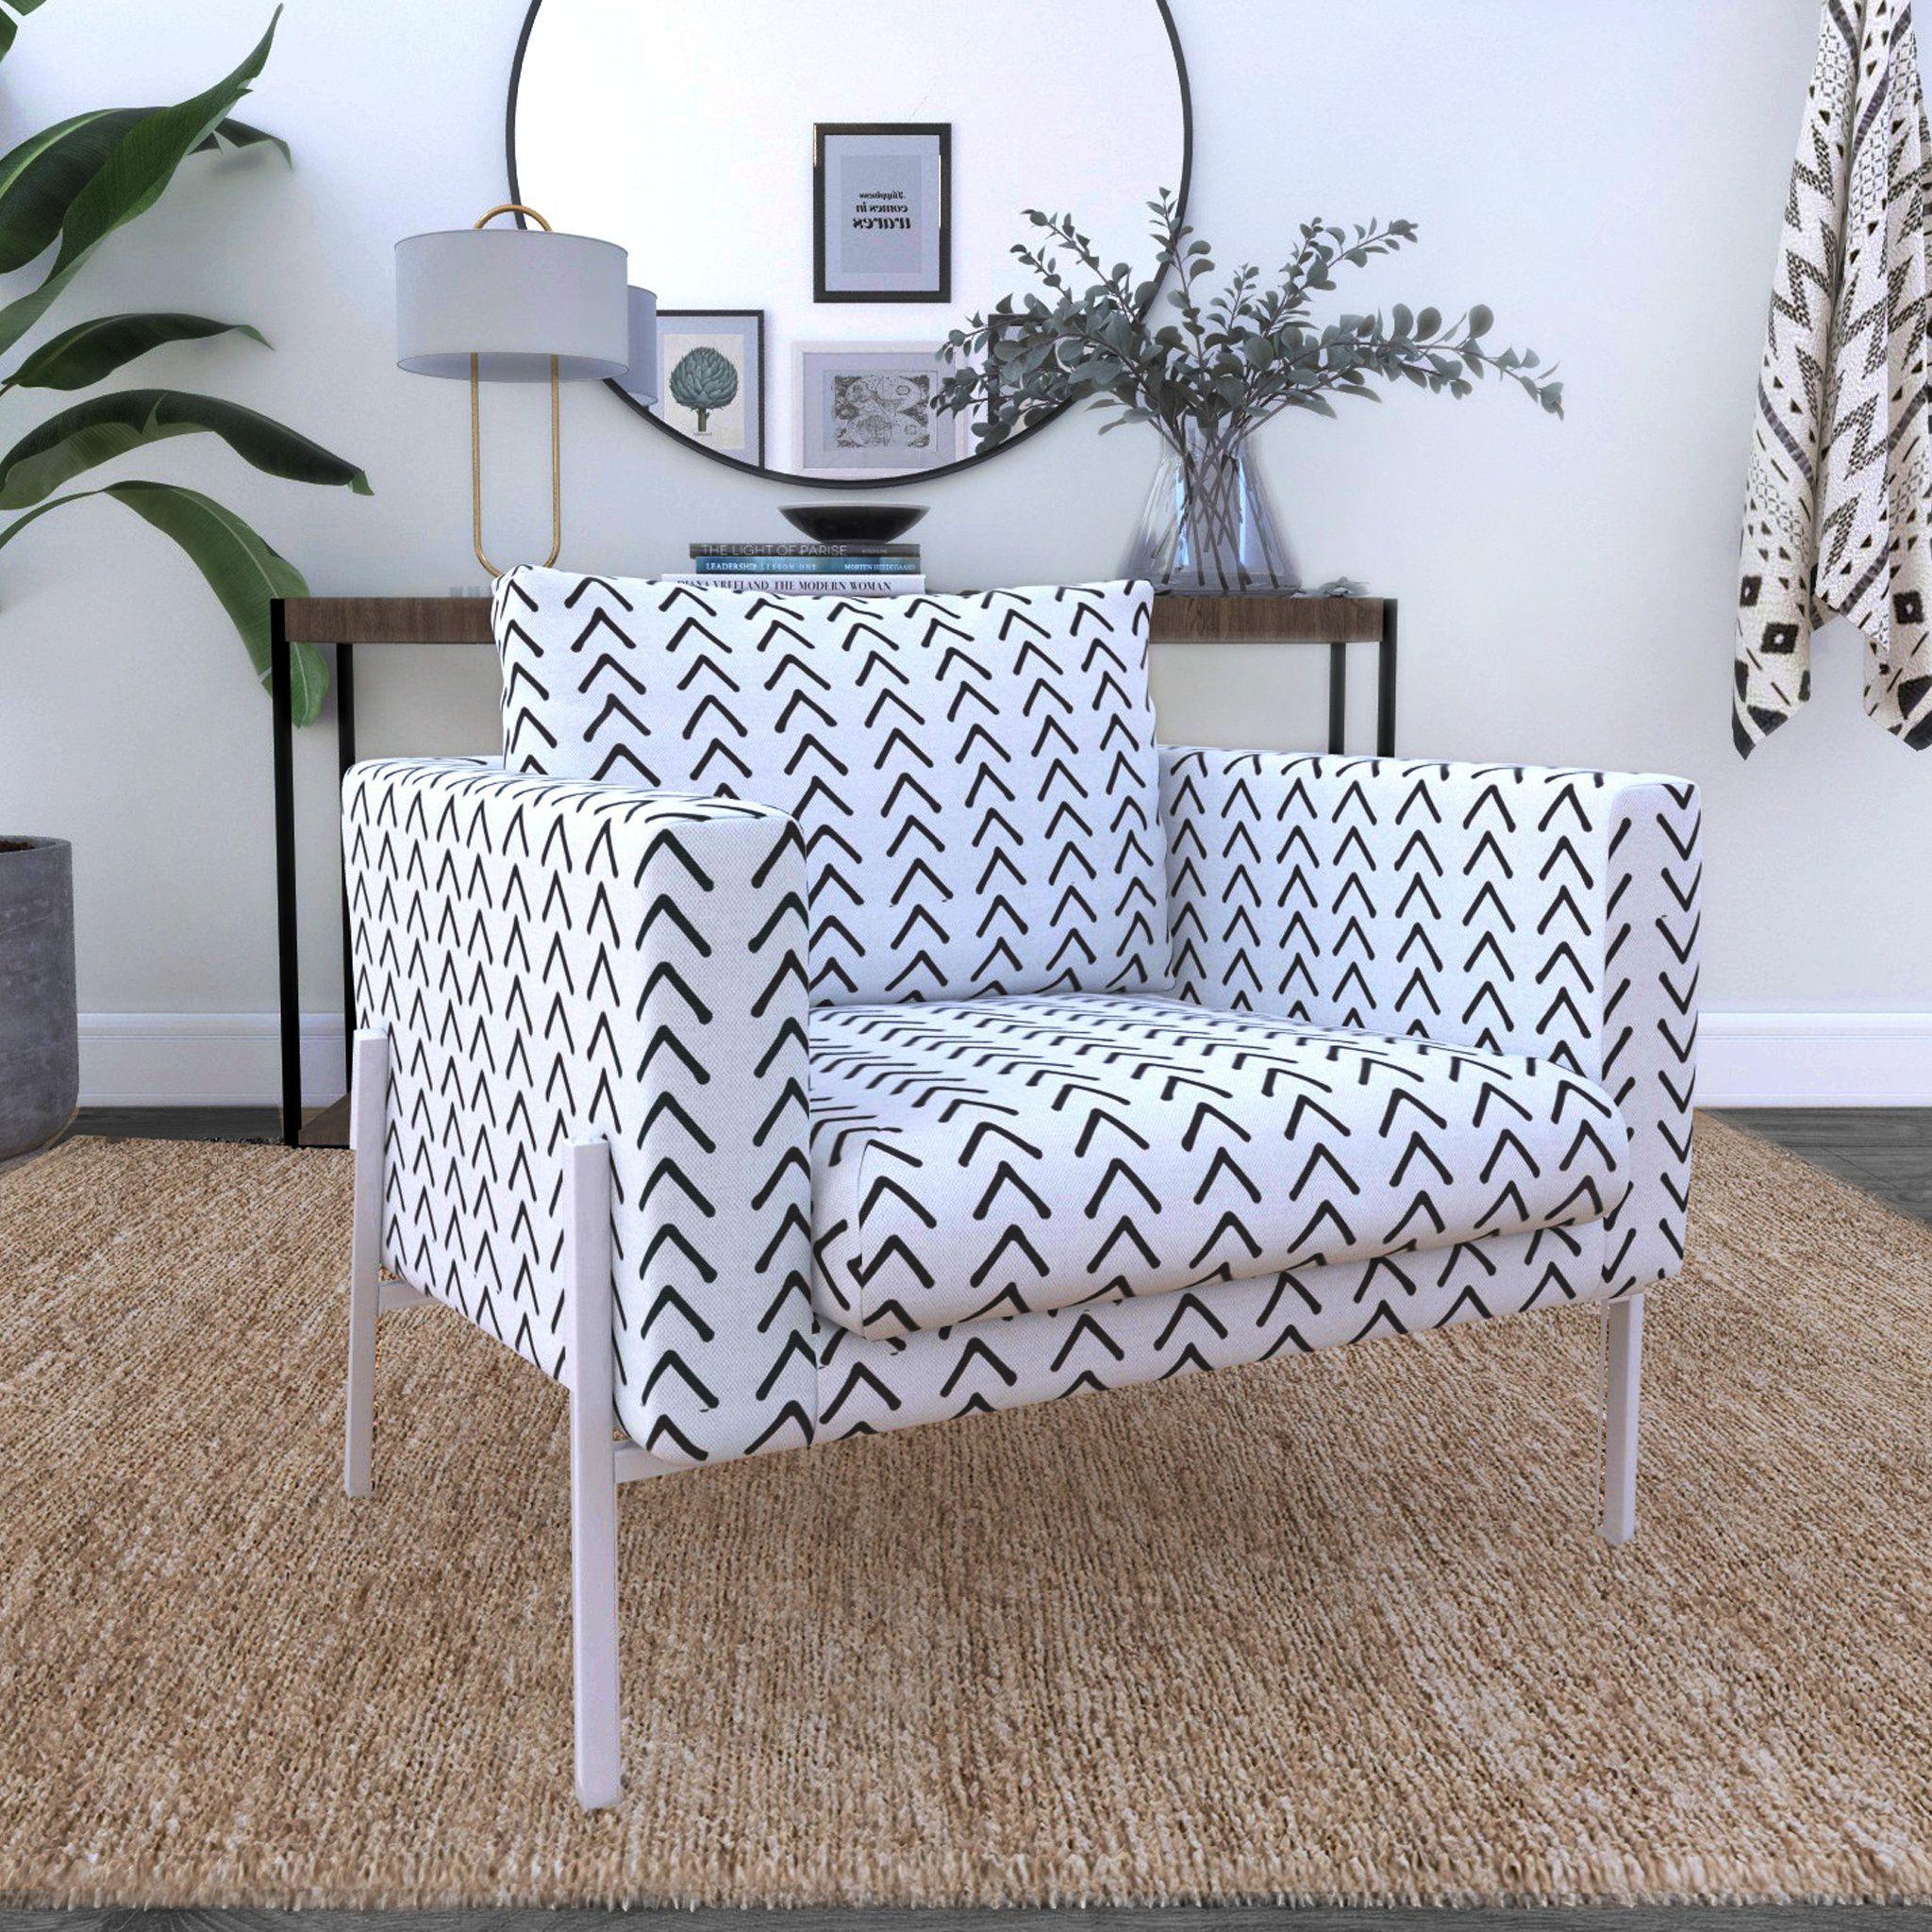 IKEA KOARP Armchair Covers, Arrows Tribal Print, African ...